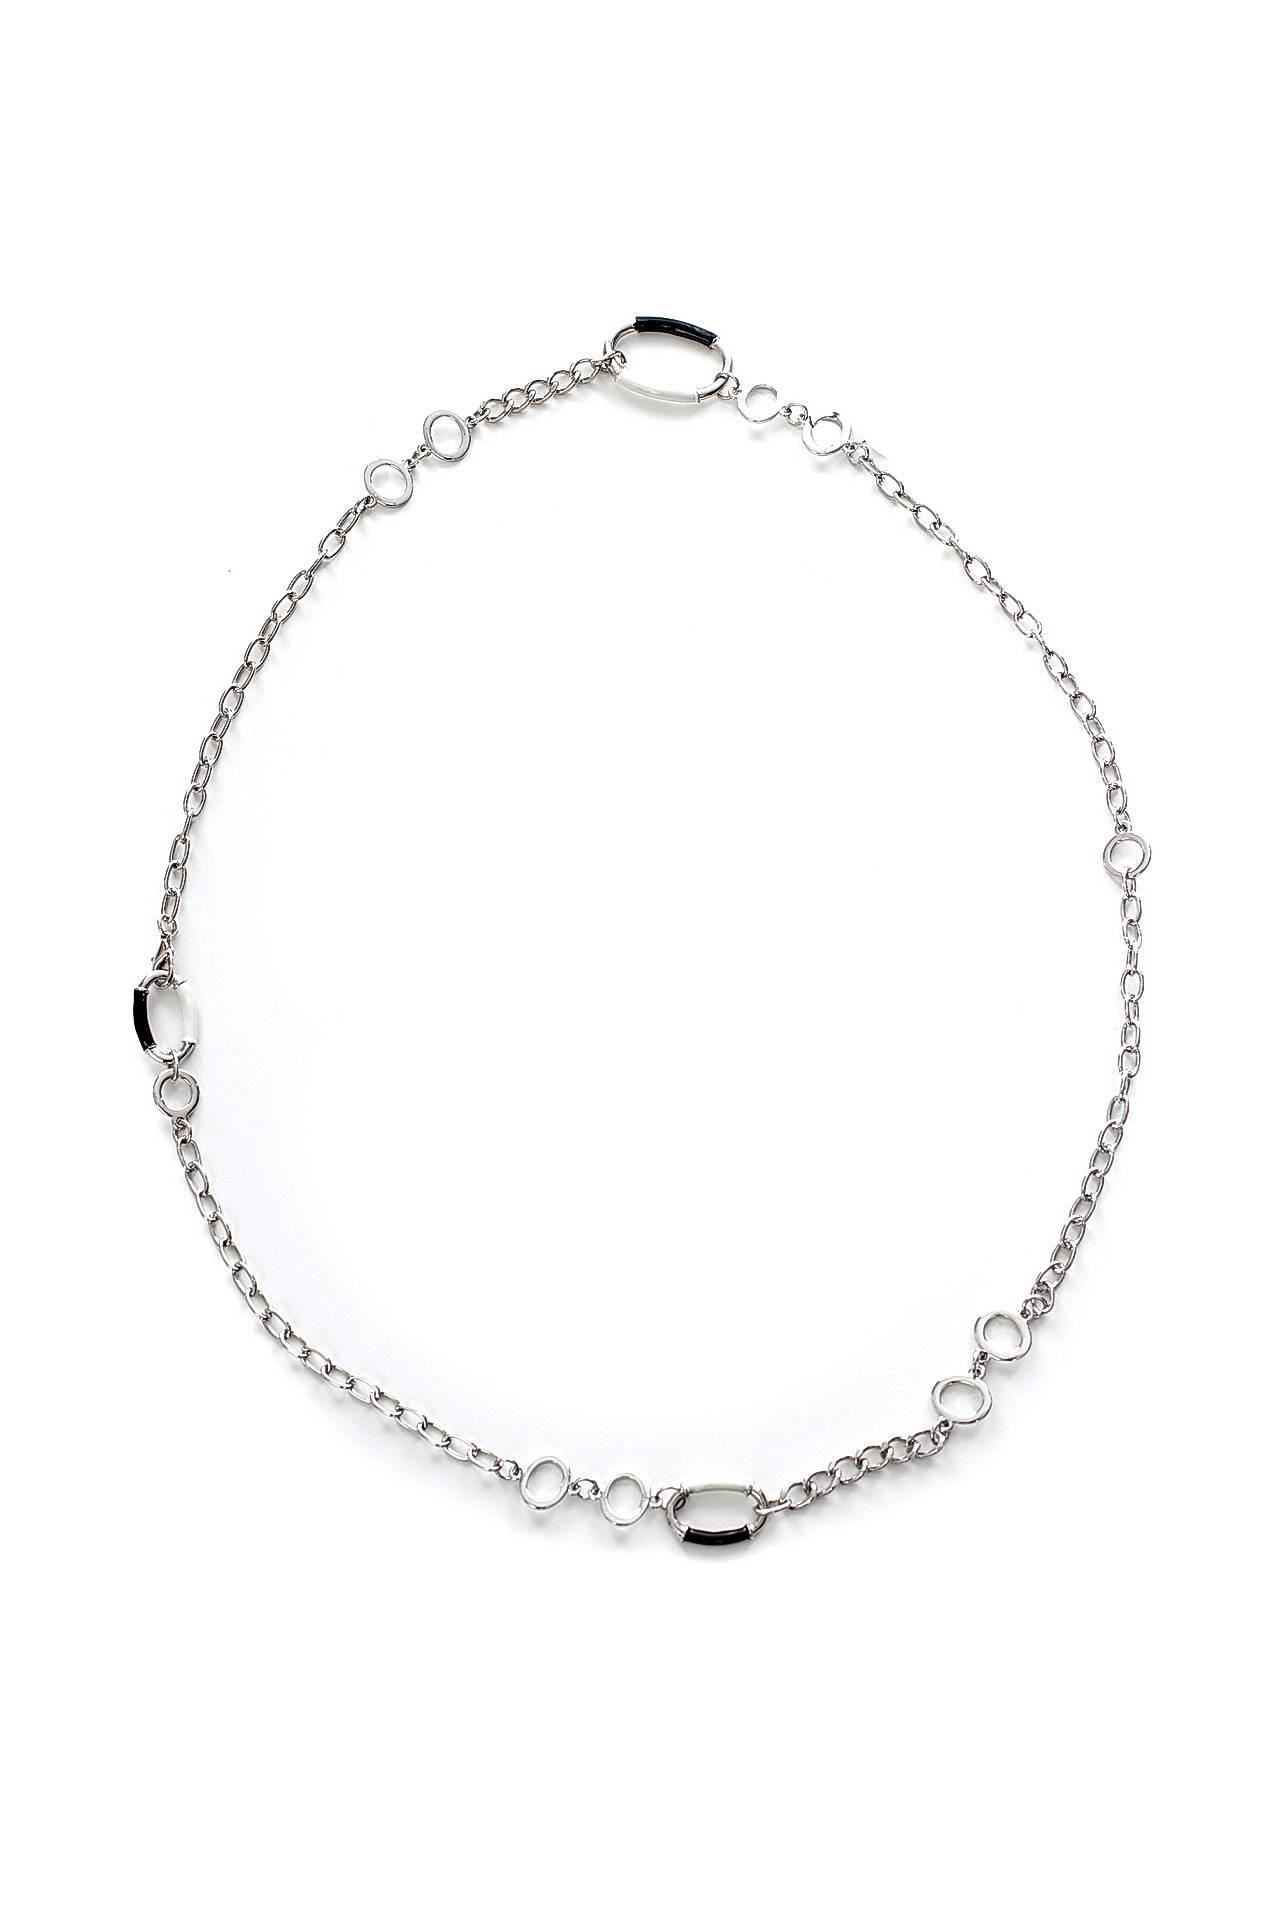 Цепь/цепочка бижутерная EUROBIJOUX 21778-Б/р серебряная цепочка